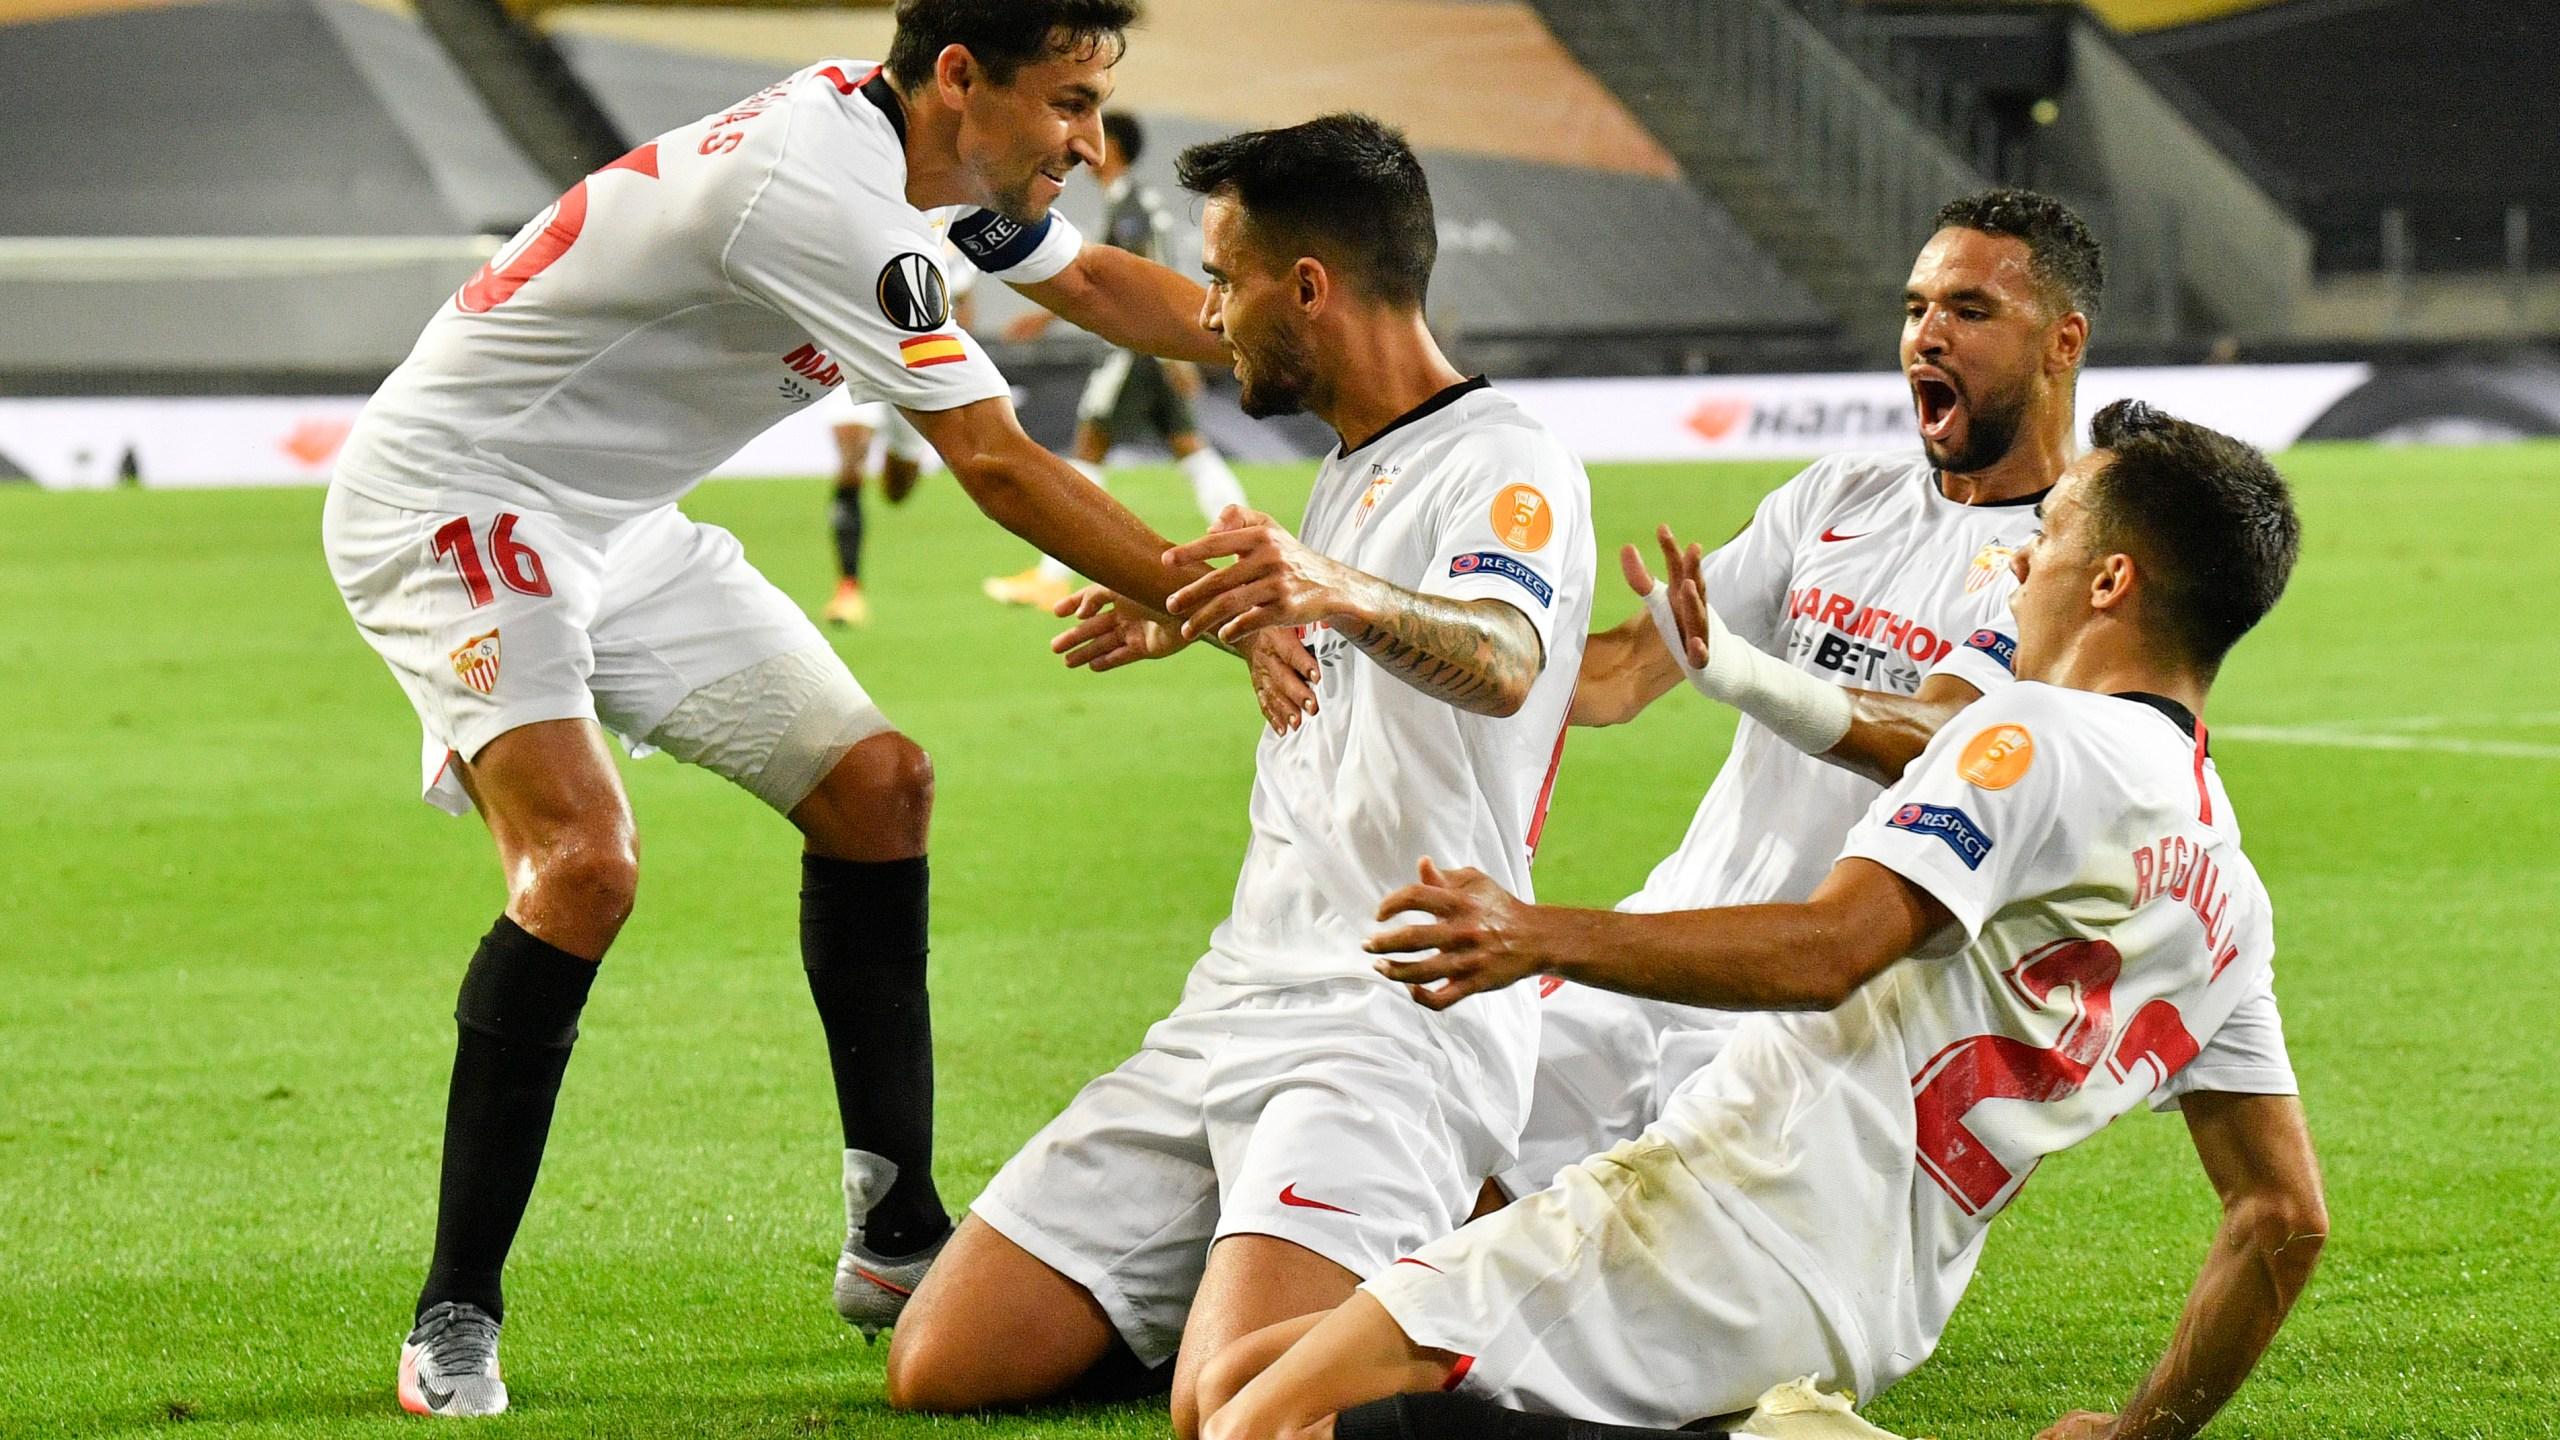 europa league final resurgent inter or sevilla s record wkrg news 5 2